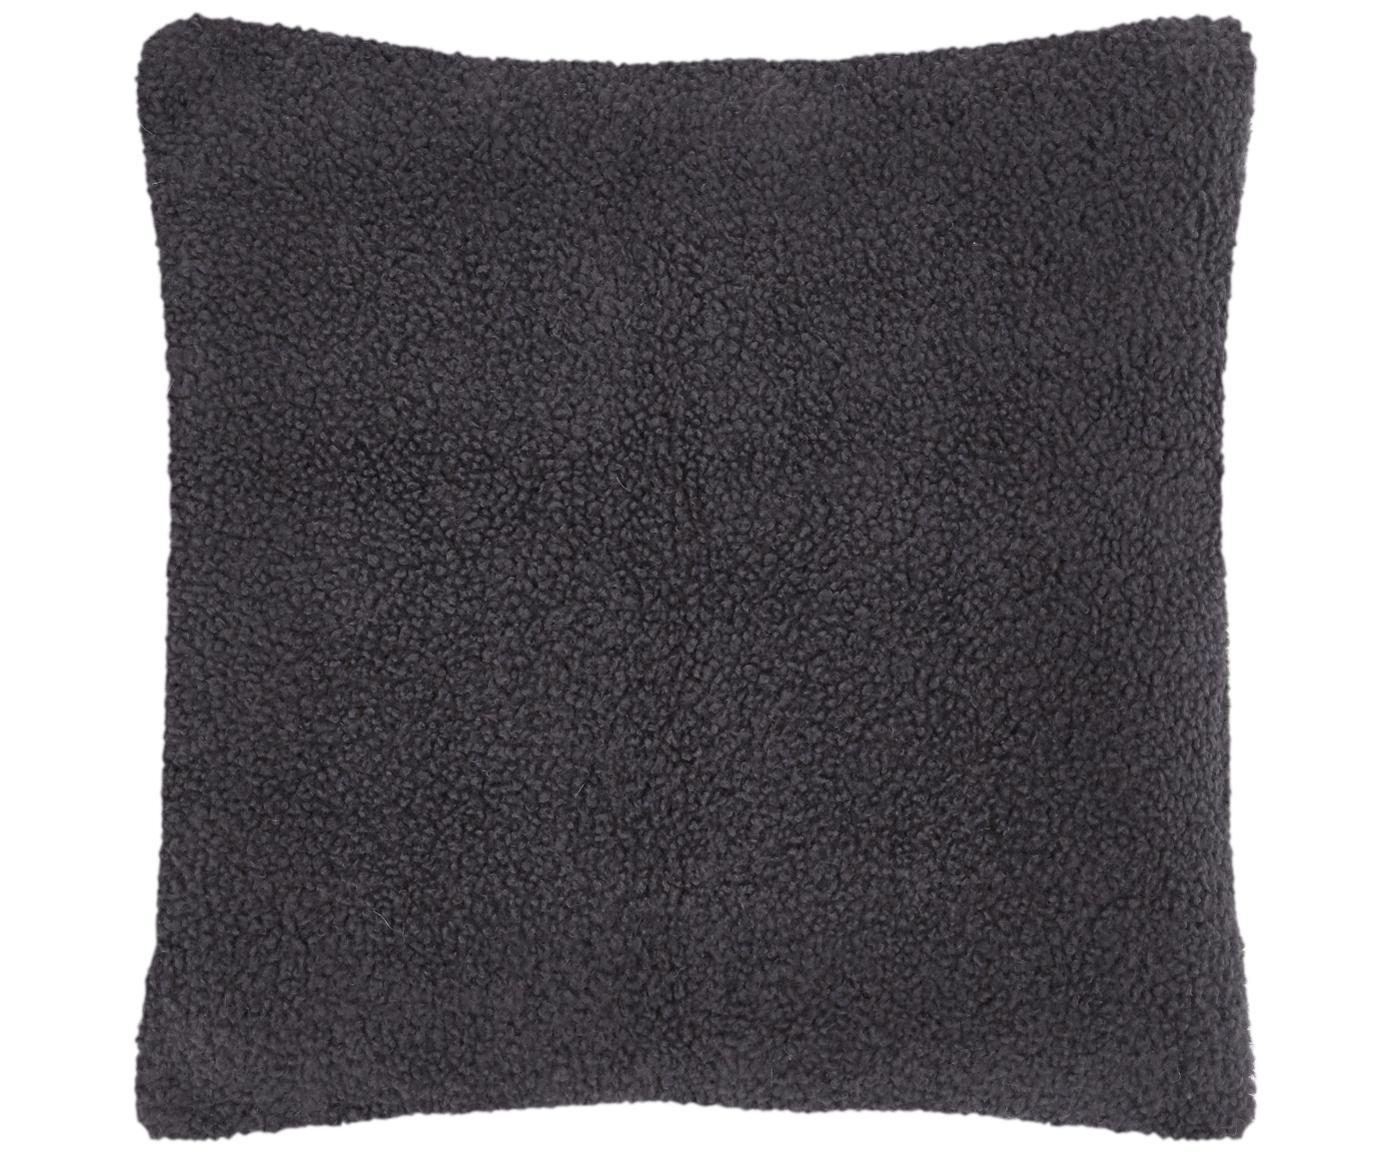 Flauschige Teddy-Kissenhülle Mille, Vorderseite: 100% Polyester (Teddyfell, Rückseite: 100% Polyester (Teddyfell, Dunkelgrau, 45 x 45 cm